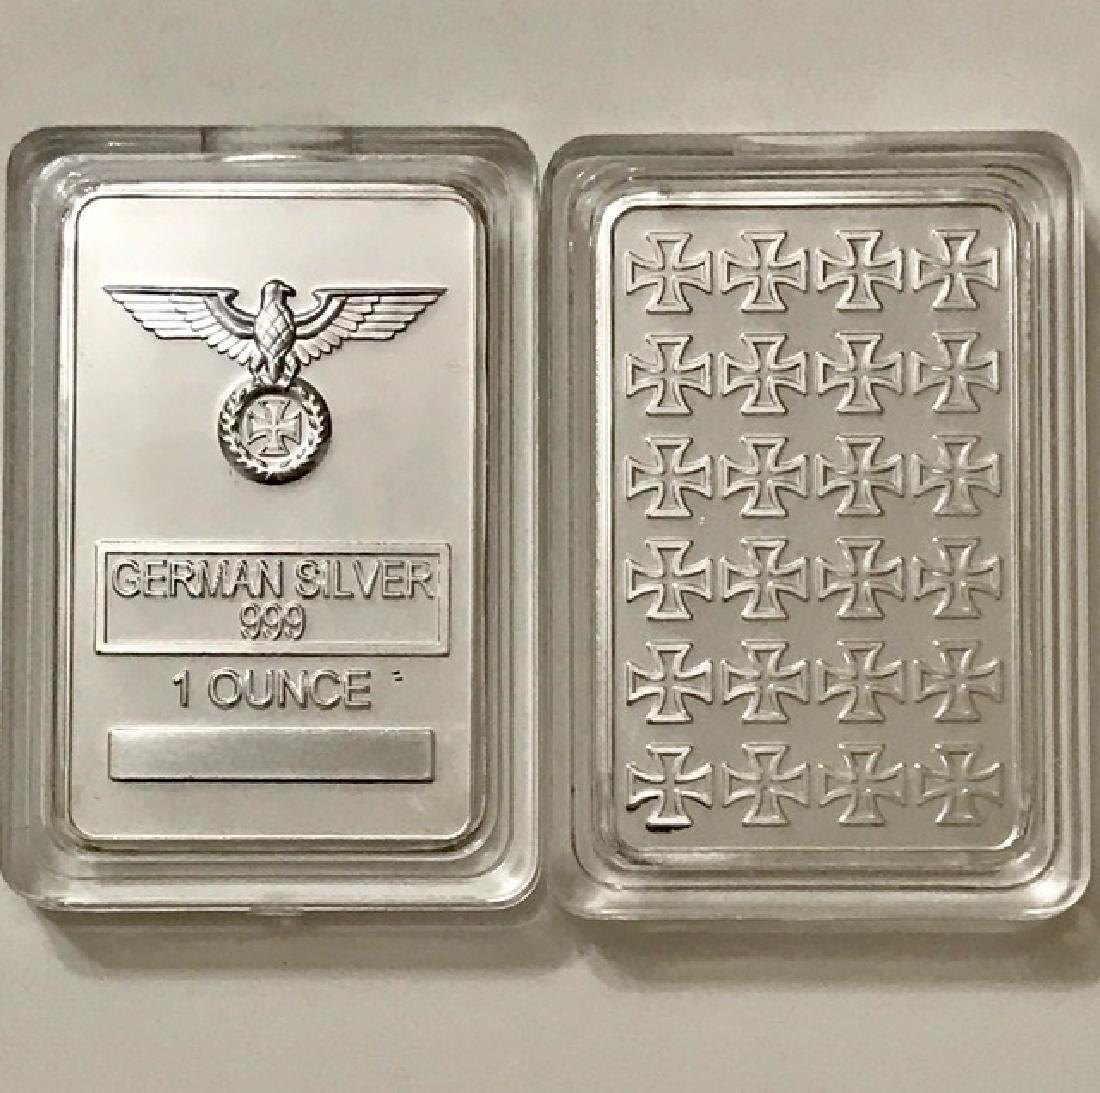 1 Oz .999 Iron Cross German Silver Bullion Bar